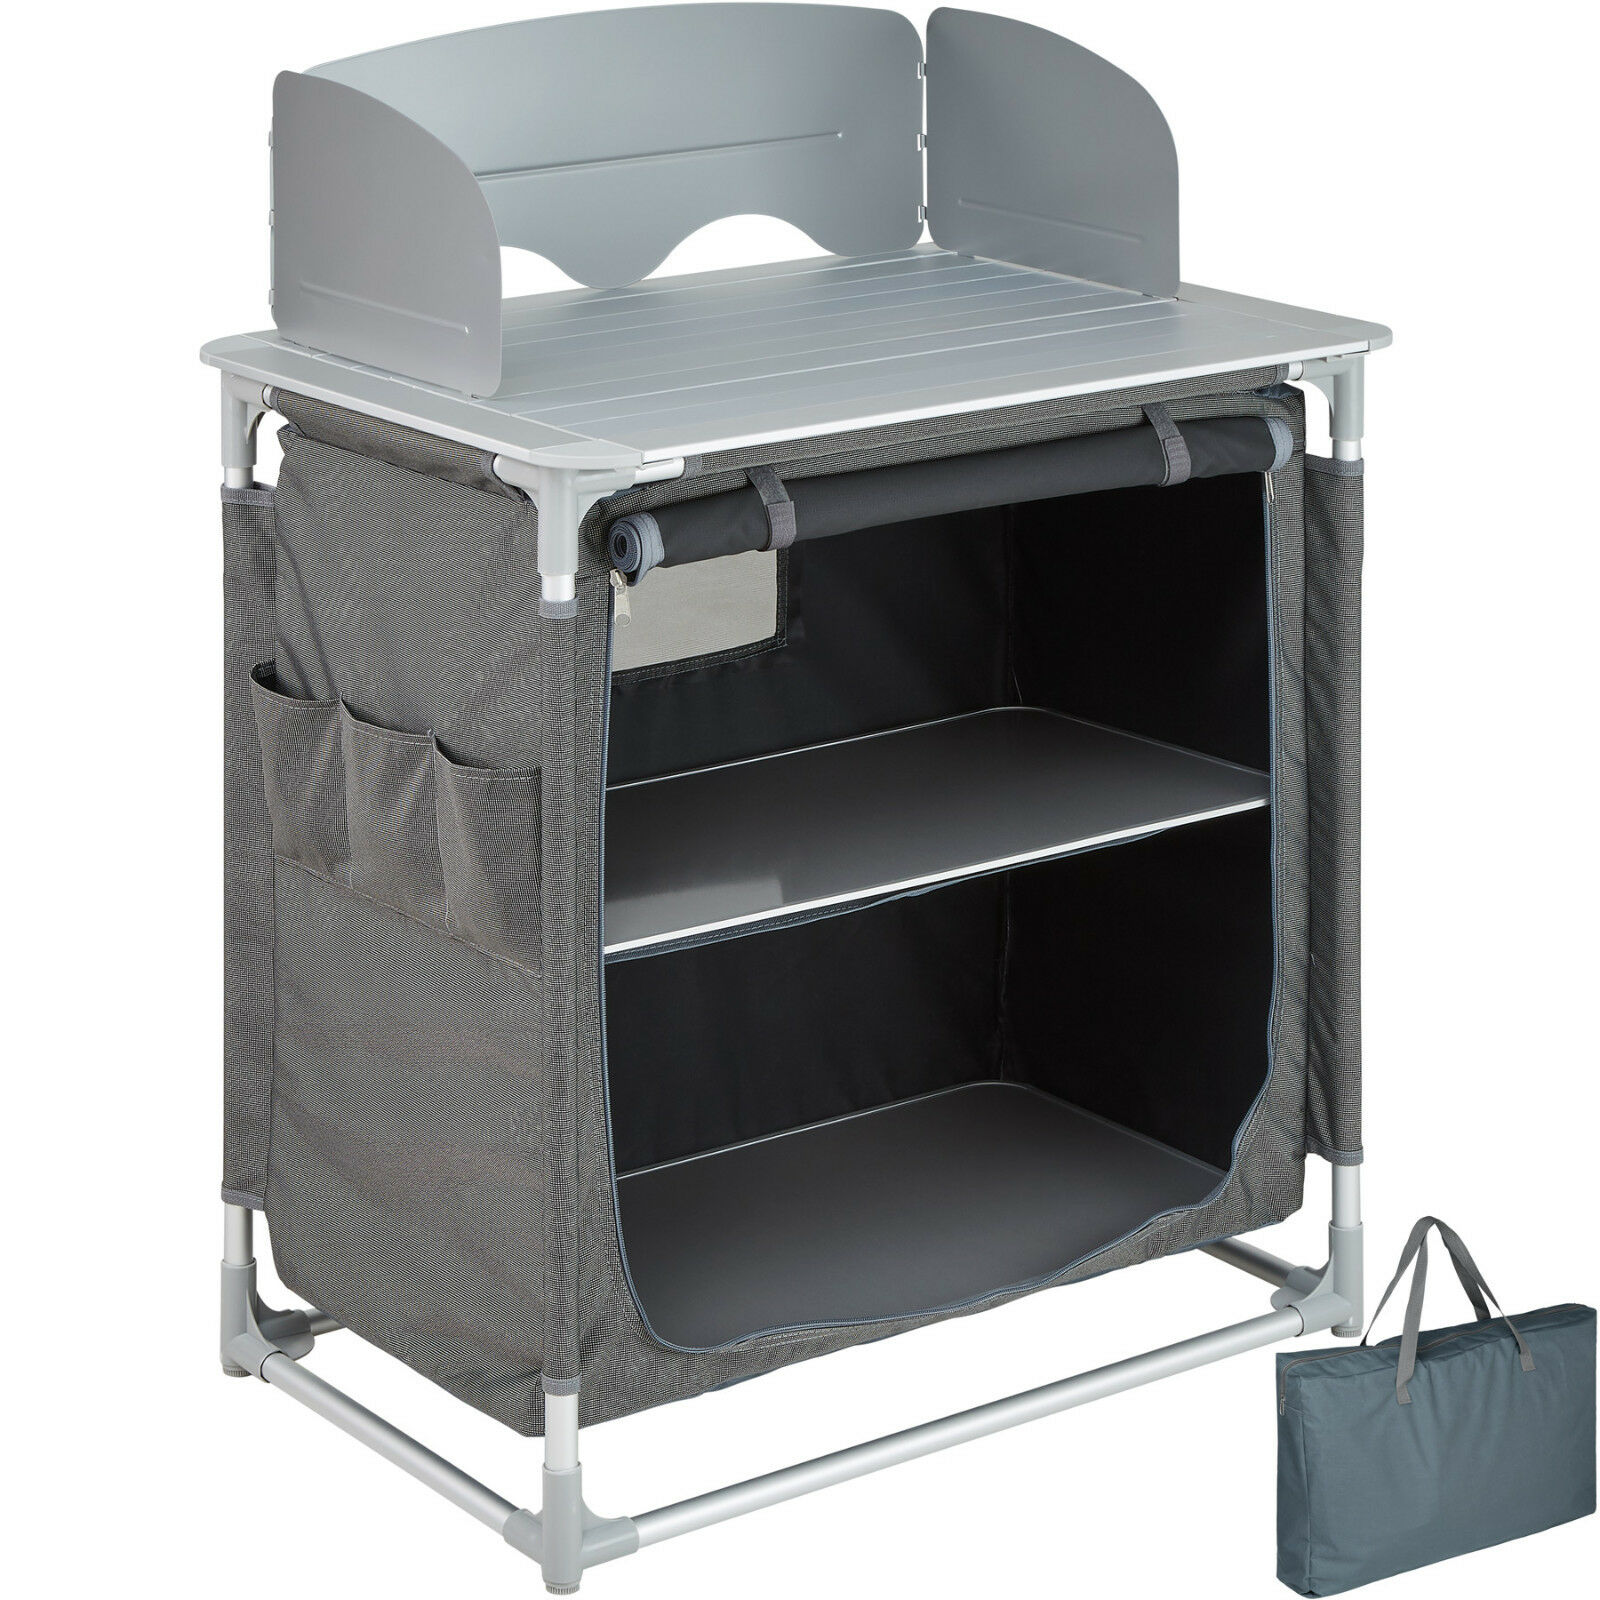 Cuisine de camping armoire table placard aluminium mobilier box jardin pliable